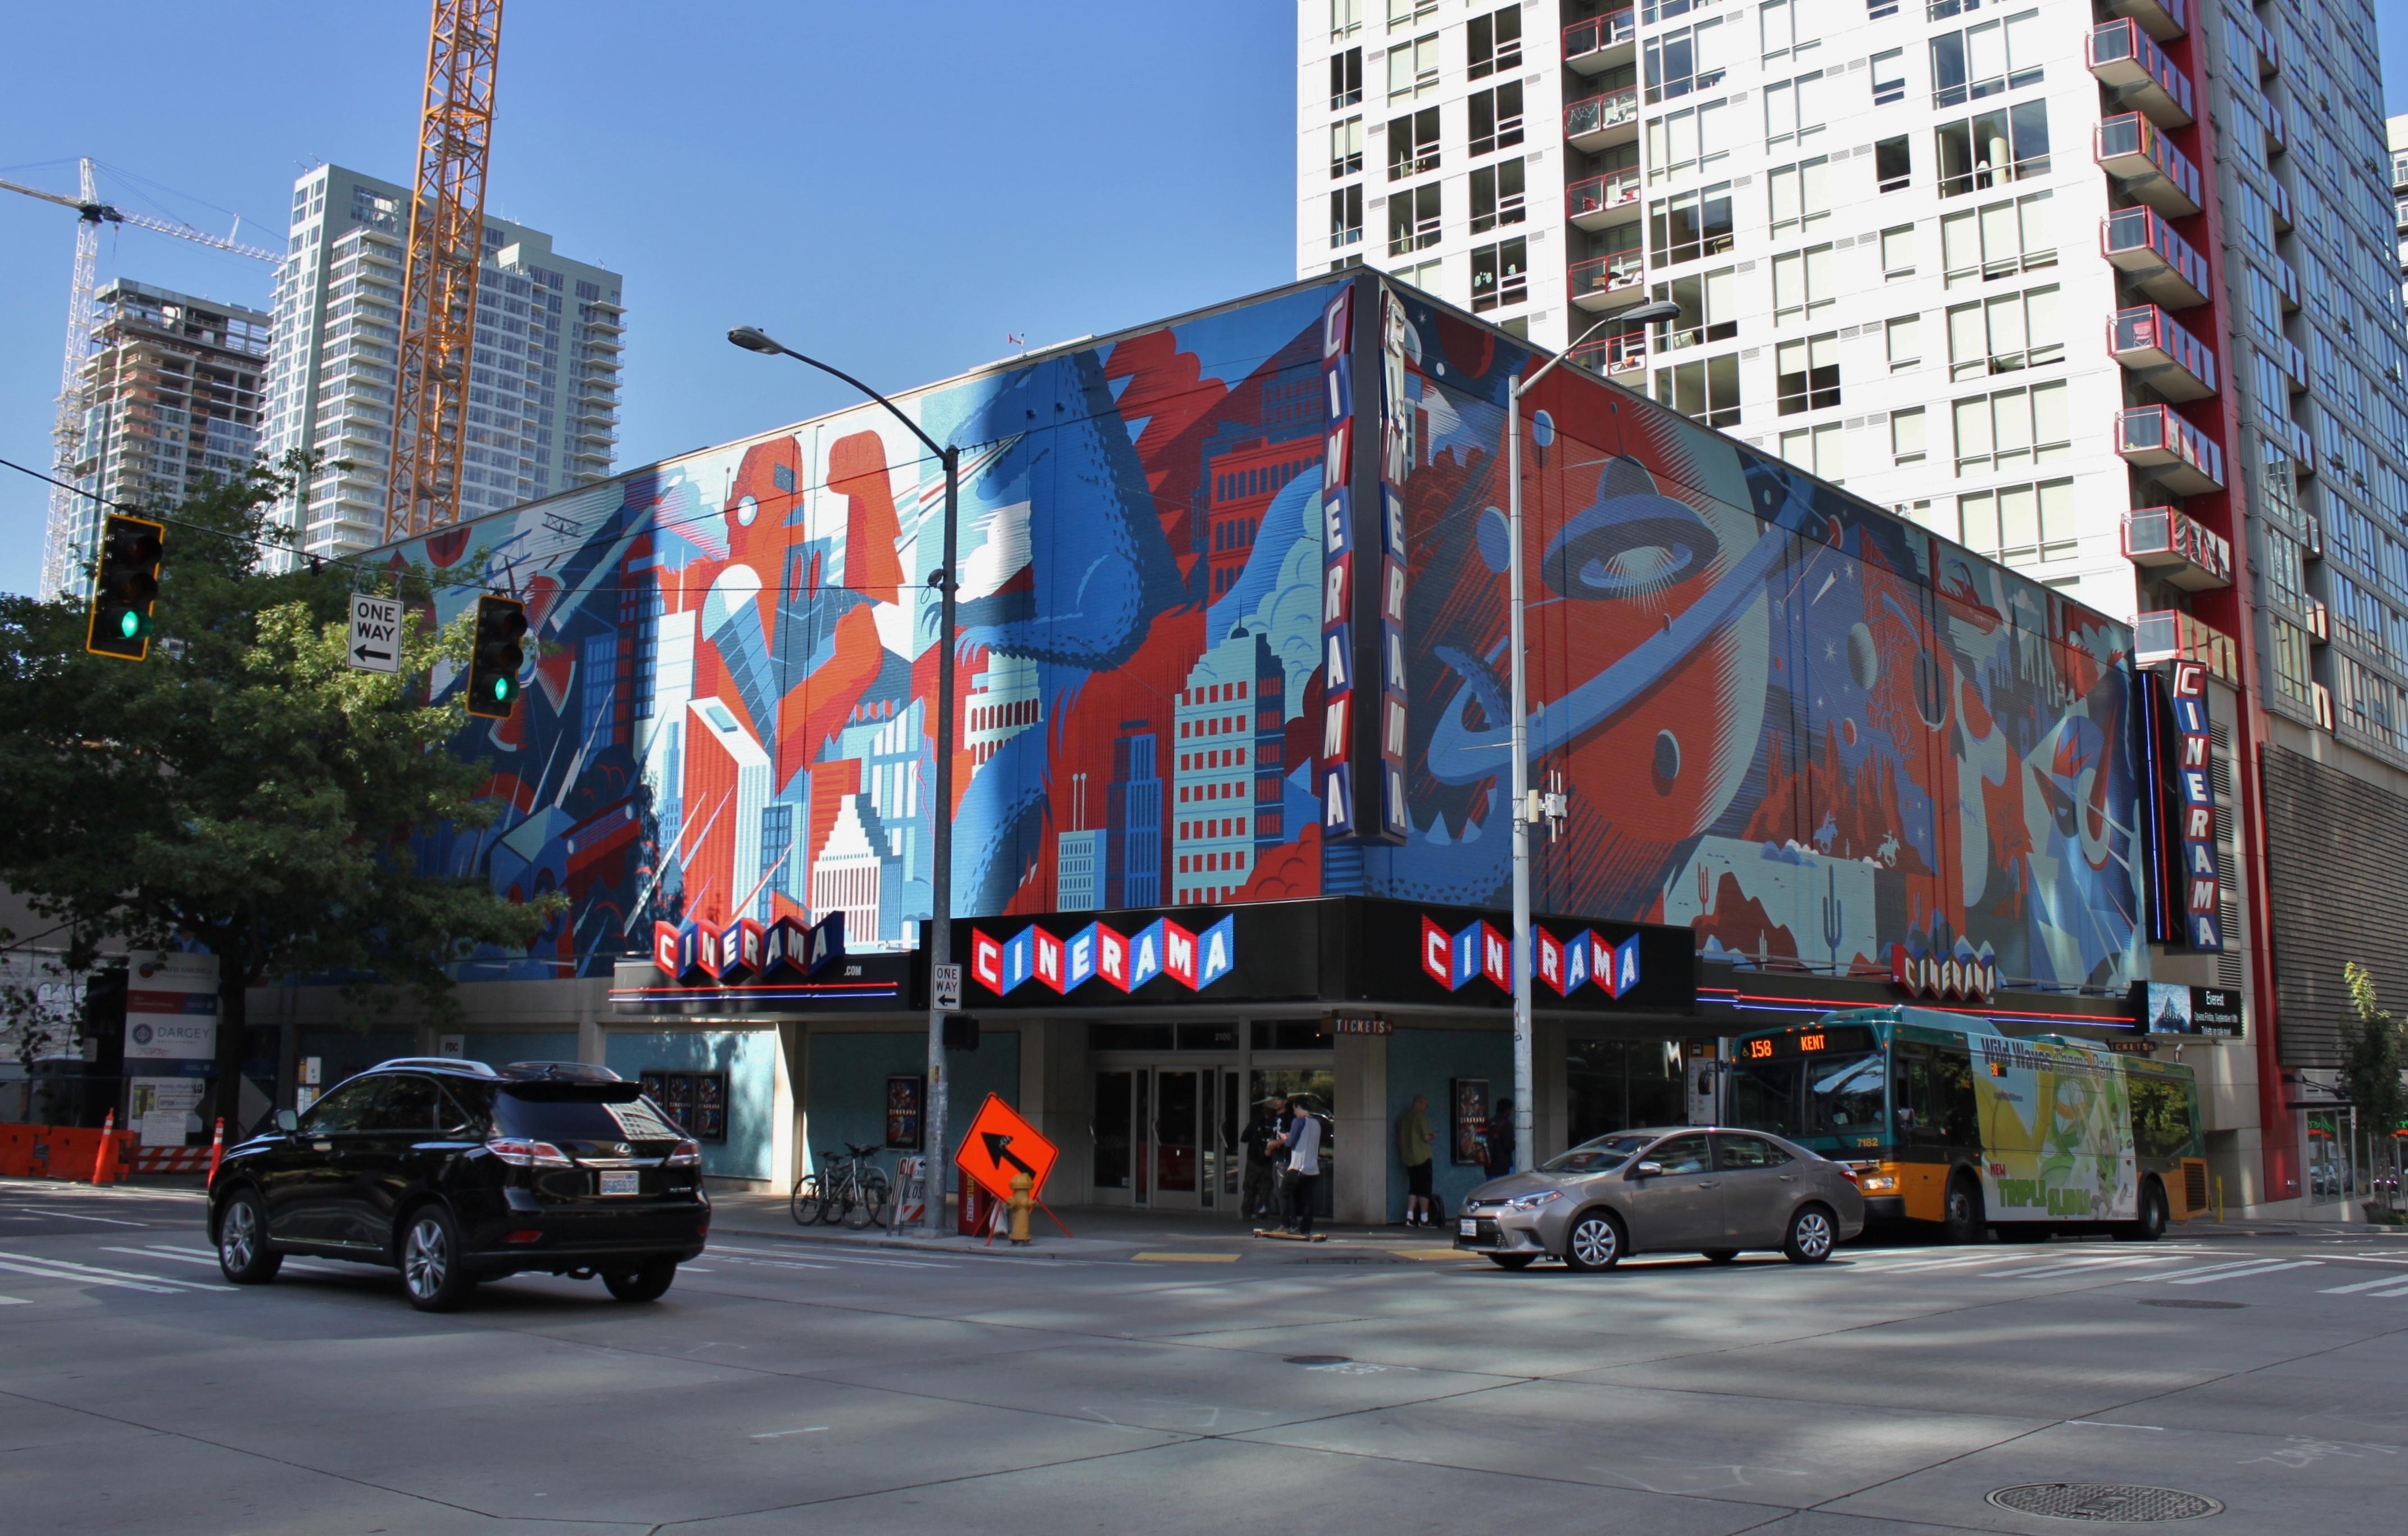 Seattle Cinerama - Wikipedia